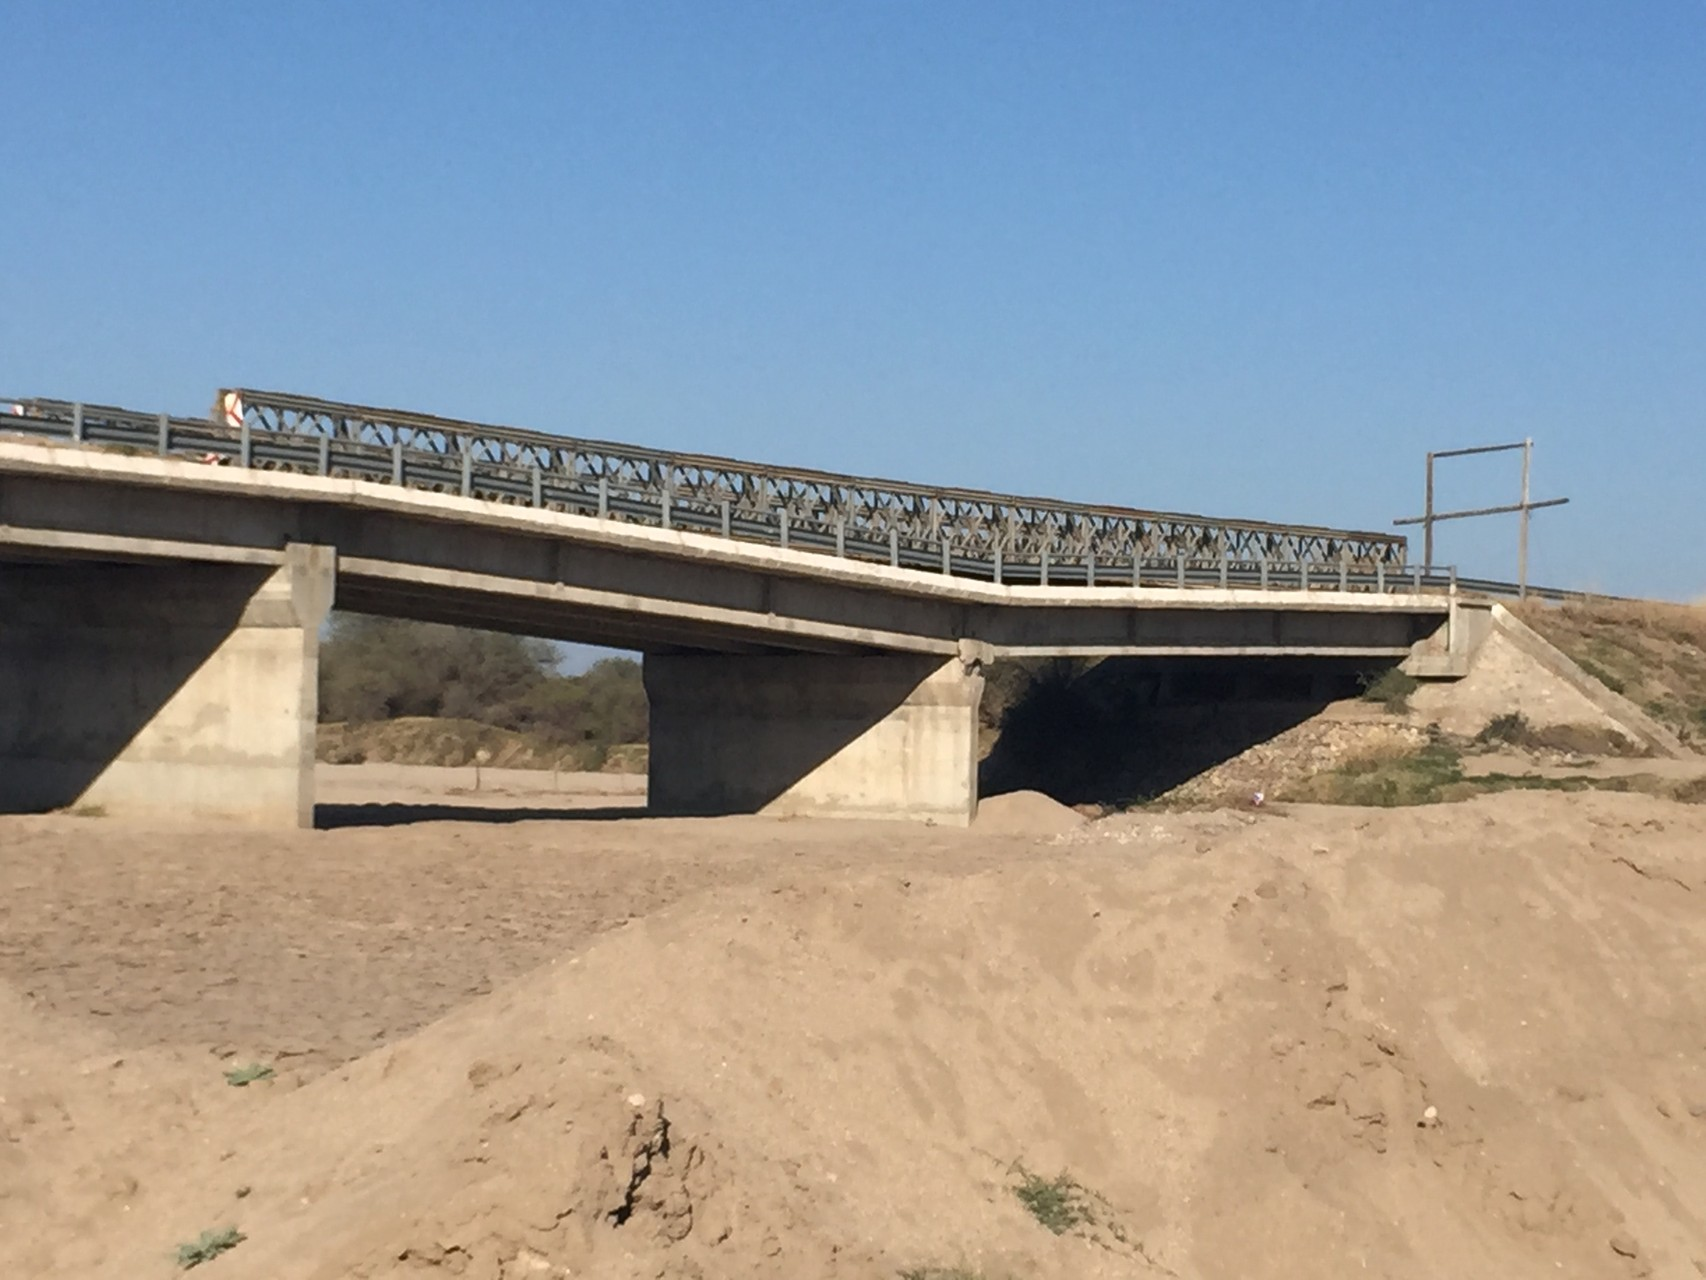 Brücke vom Fluss weggerissen